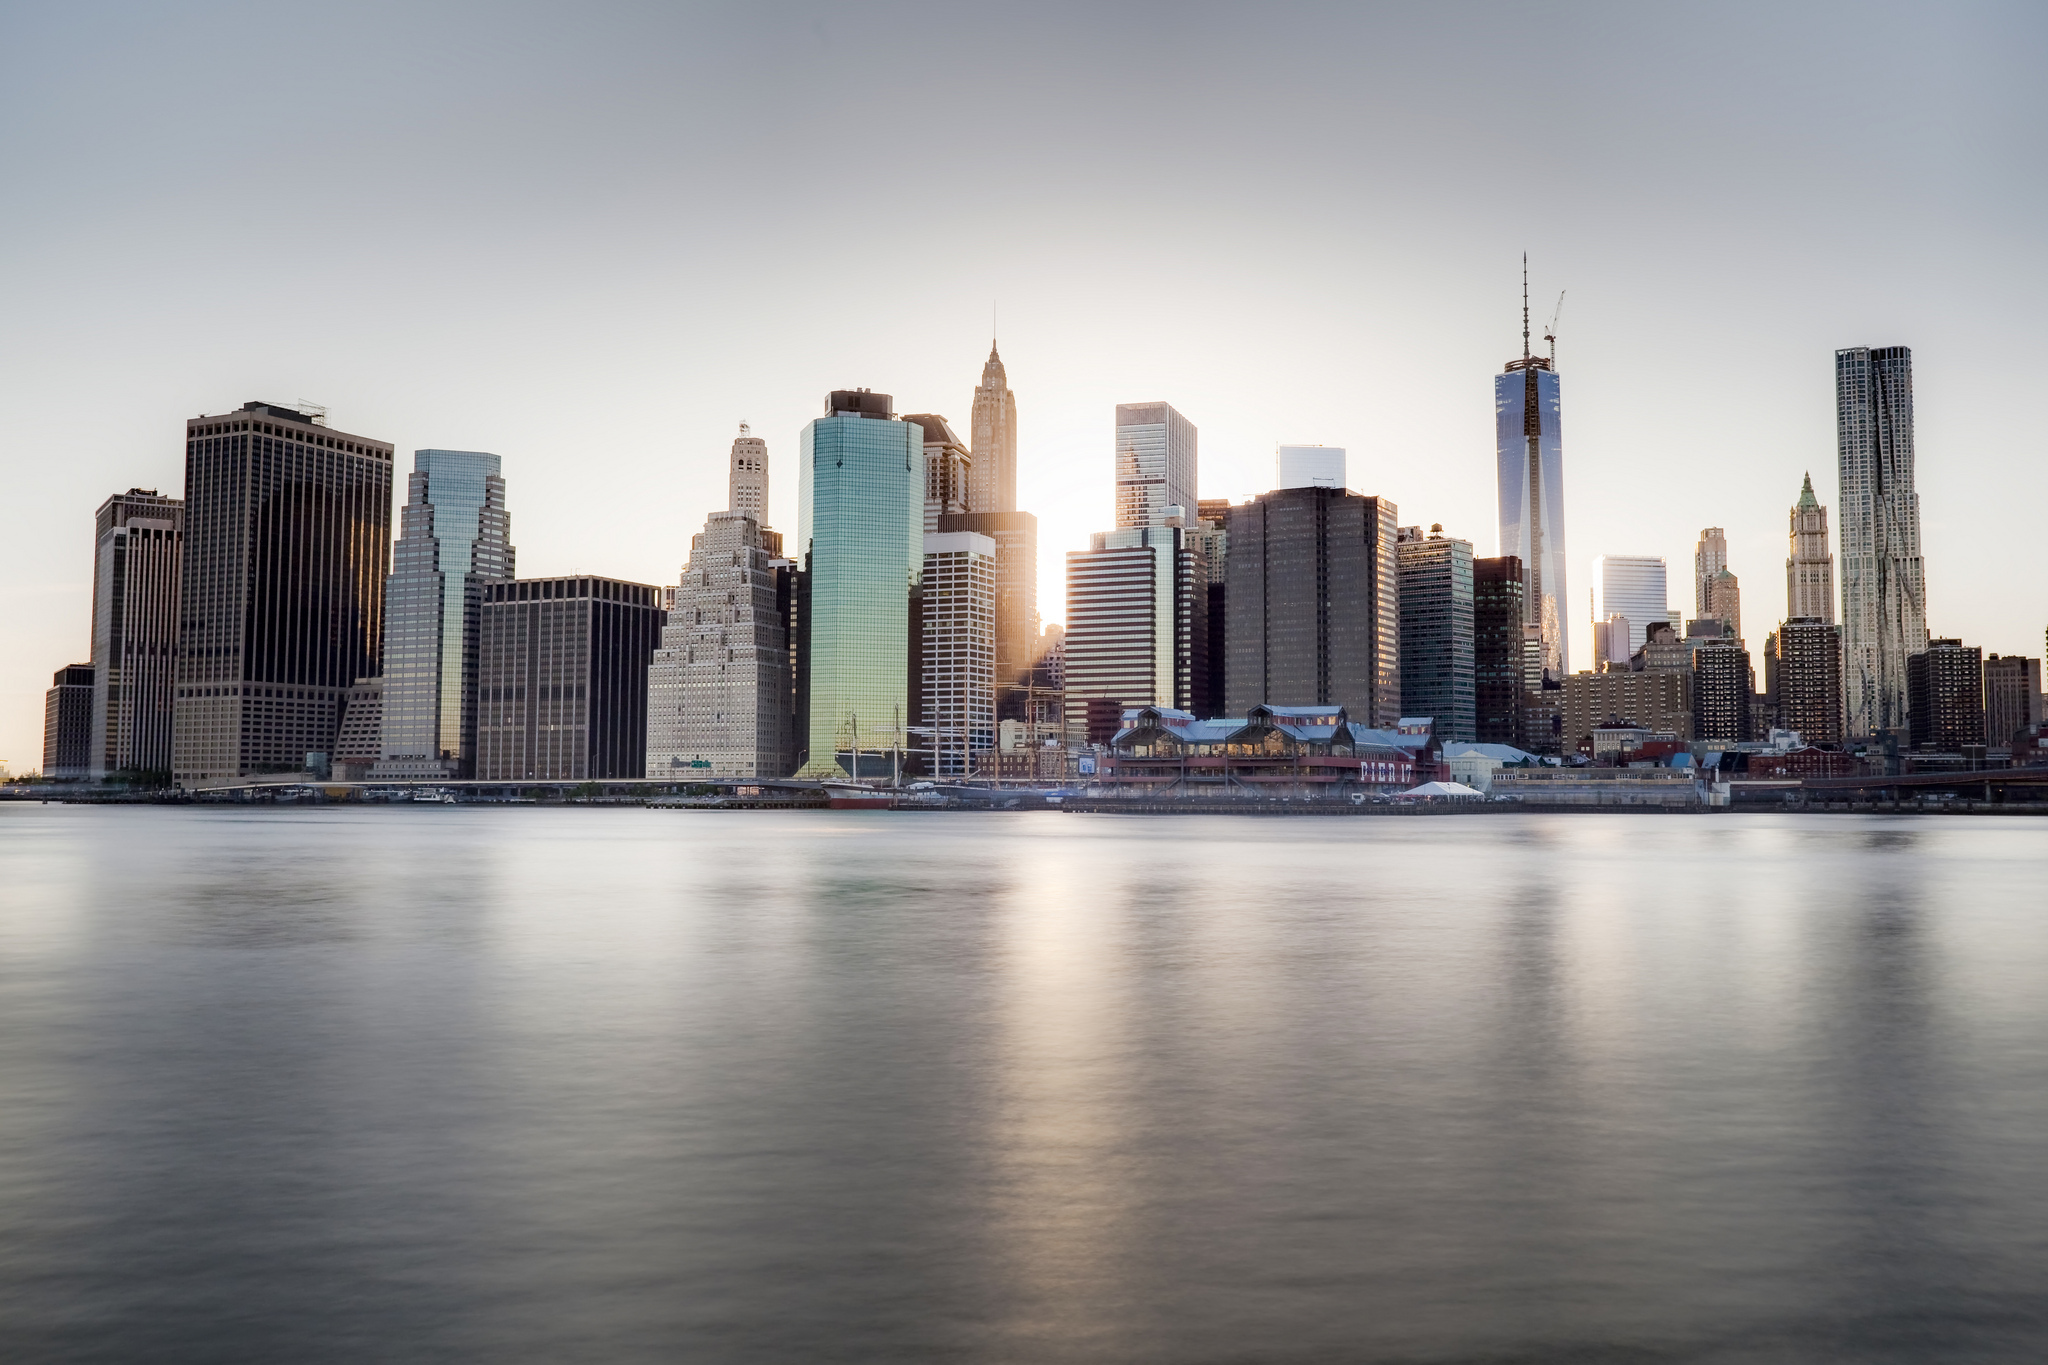 Download wallpaper new york skyscrapers dumbo promenade river wallpaper save it voltagebd Images